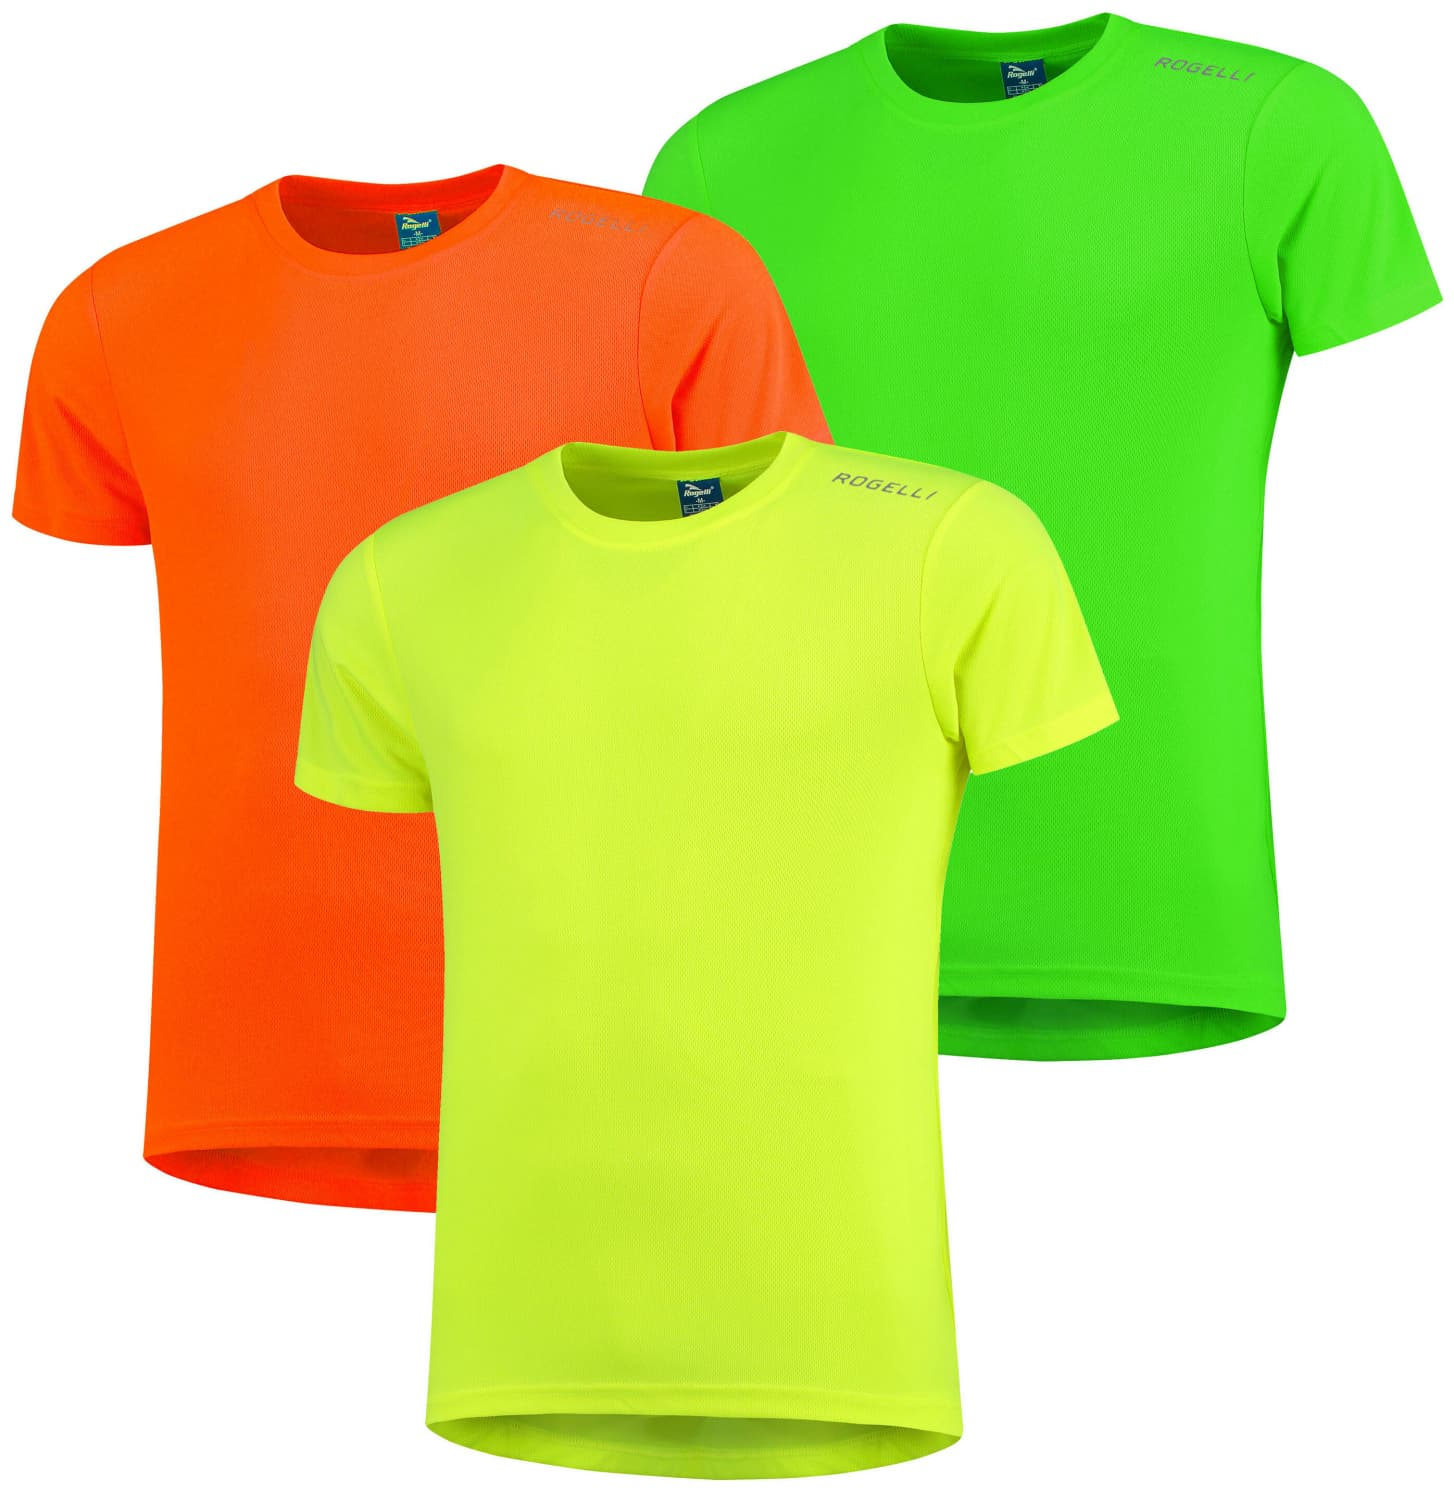 7fbdbd2c0ccd Funkčné tričká Rogelli PROMOTION MIX REFLEX - 3 ks rôzne veľkosti ...